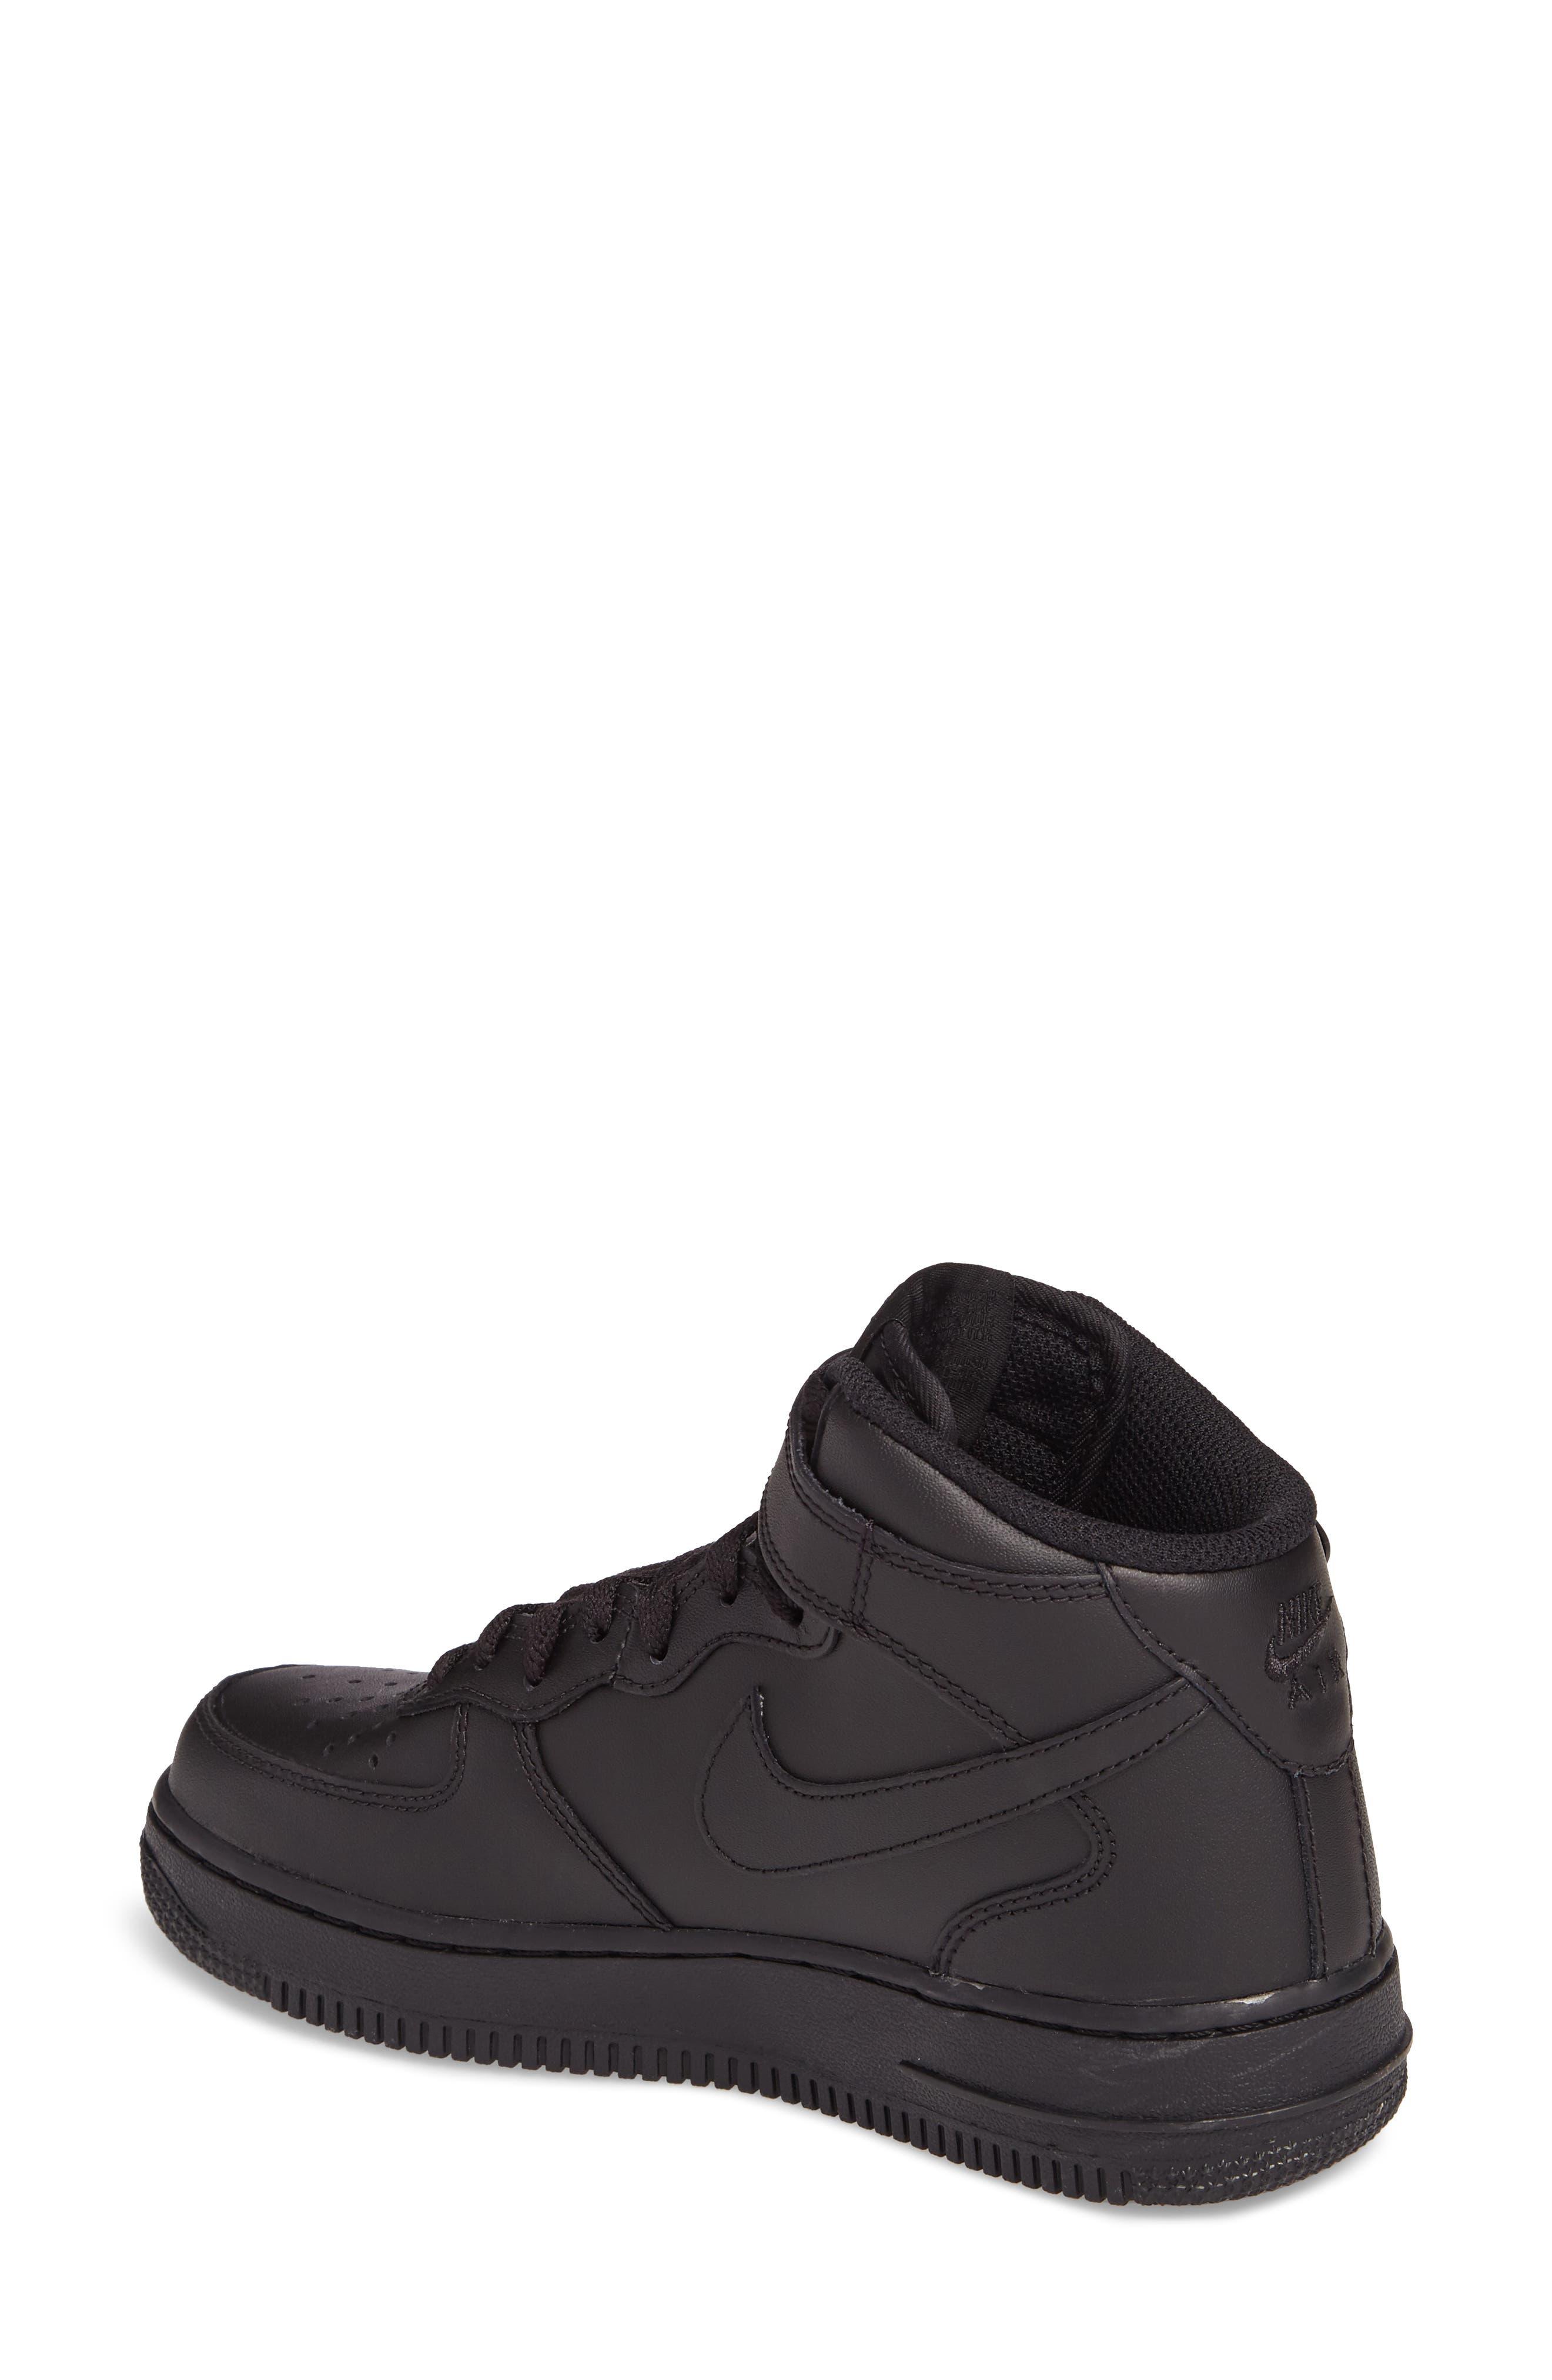 Air Force 1 '07 Mid Sneaker,                             Alternate thumbnail 2, color,                             BLACK/ BLACK